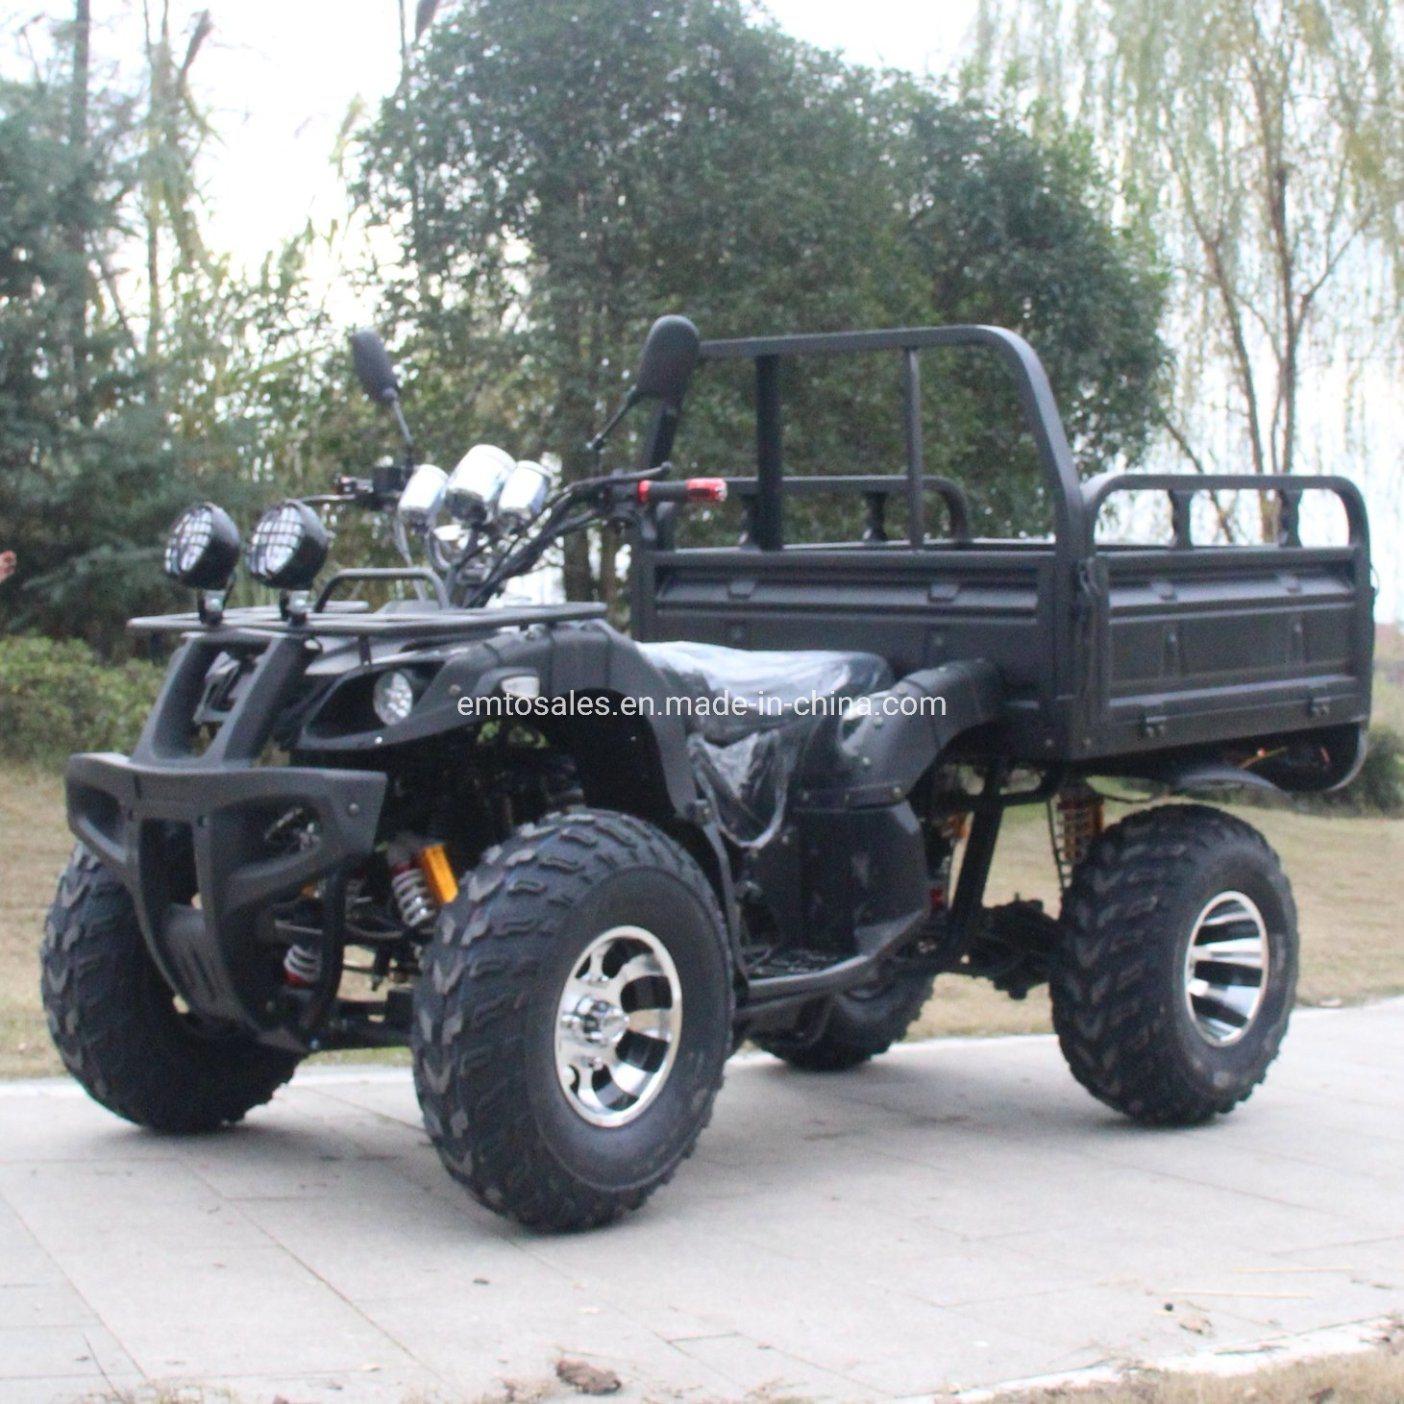 Cheap Atv For Sale >> Hot Item All Terrain Utility Farm Vehicle 250cc Adults Quad Bike Cheap Atv For Sale